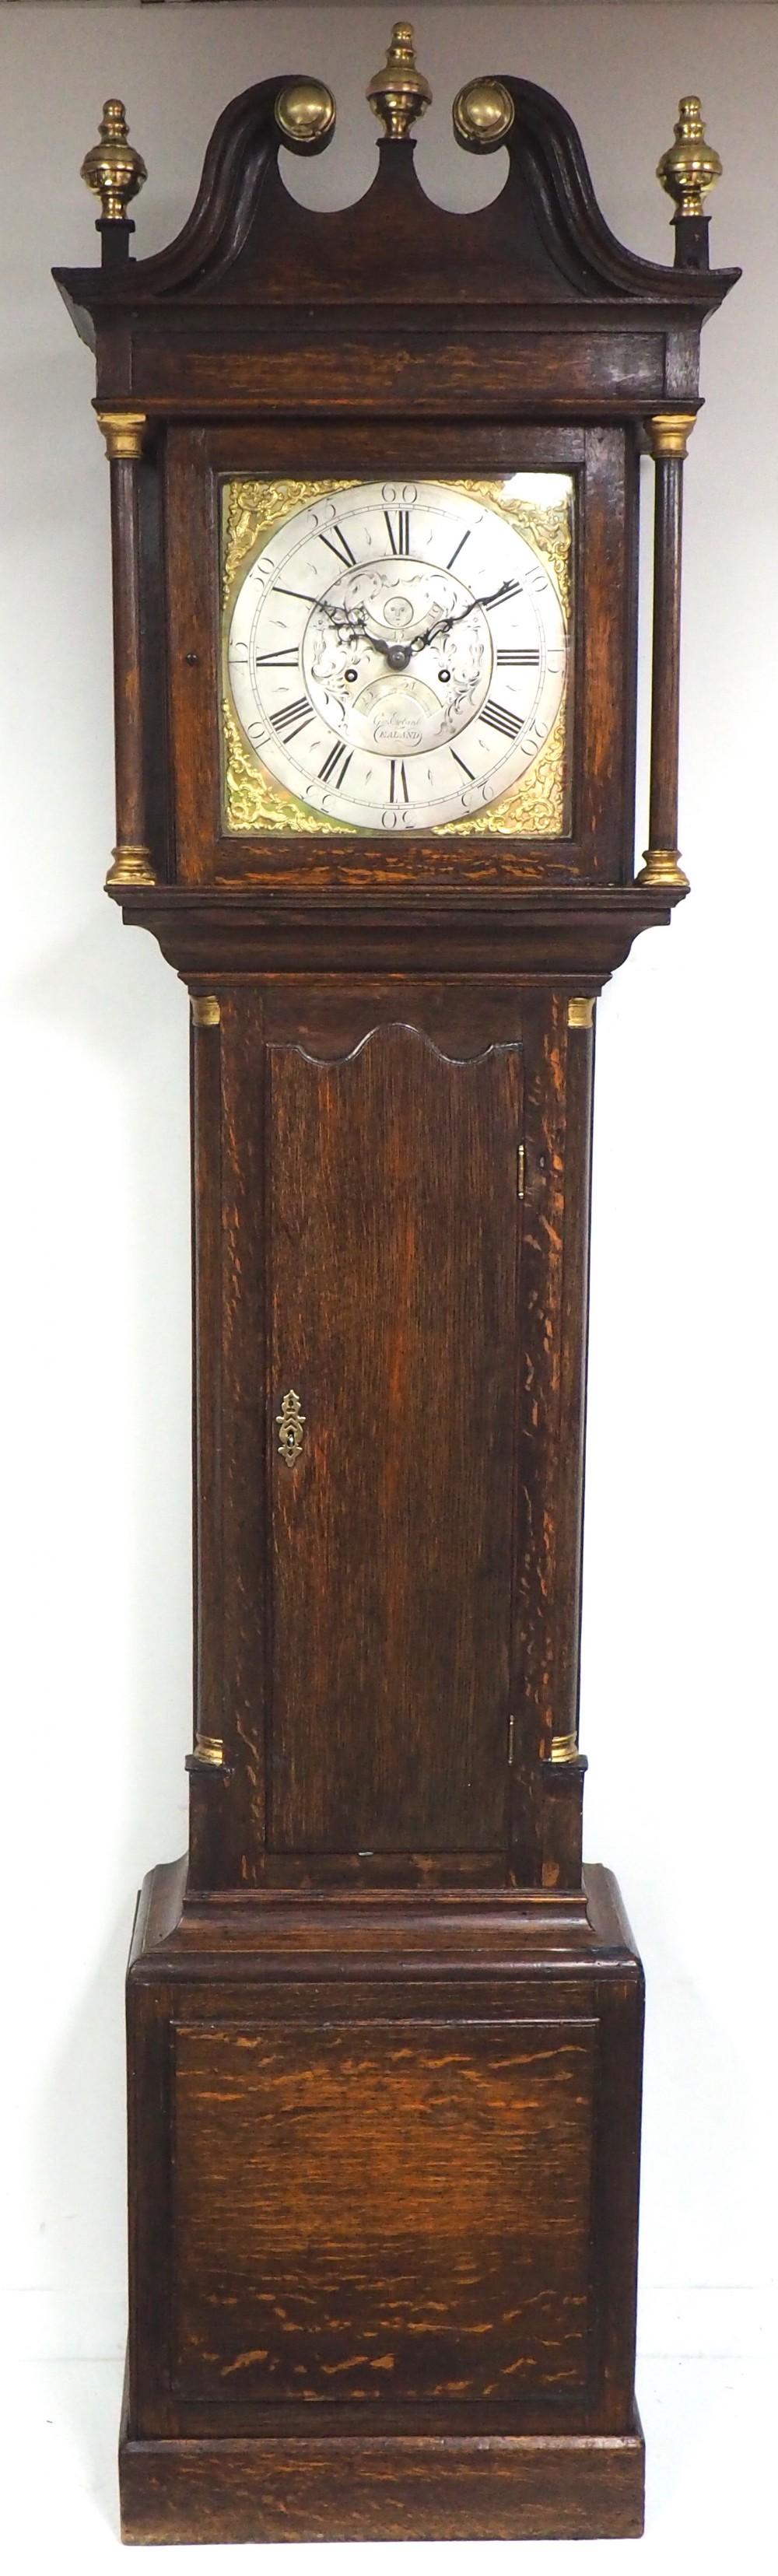 18thc english longcase clock in oak case silver brass dial signed george ewbank ealland yorkshire